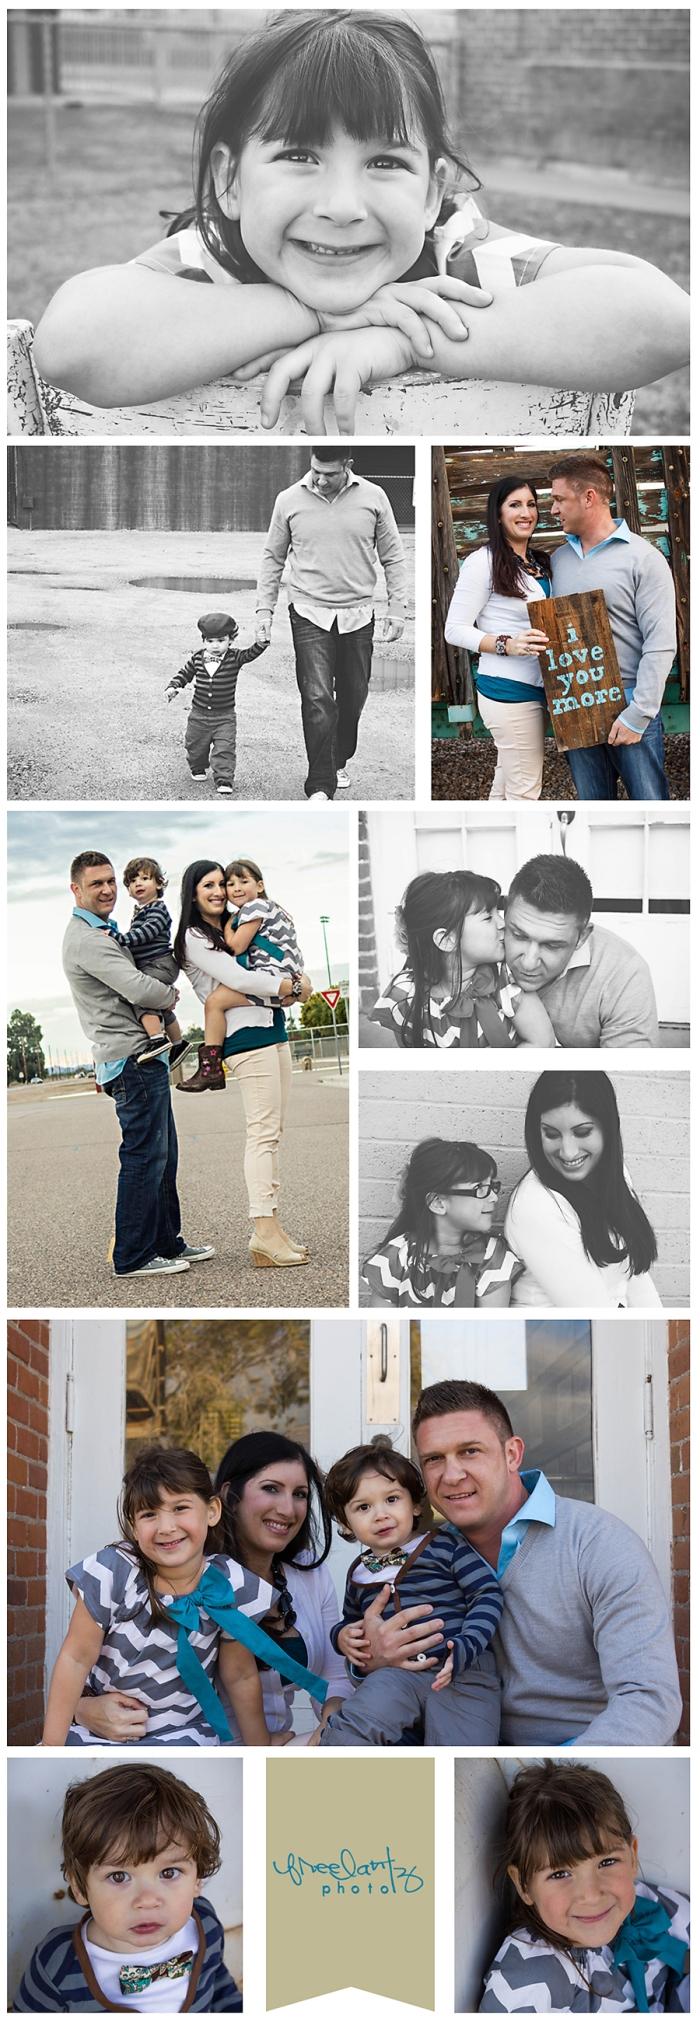 Buvala collage bb